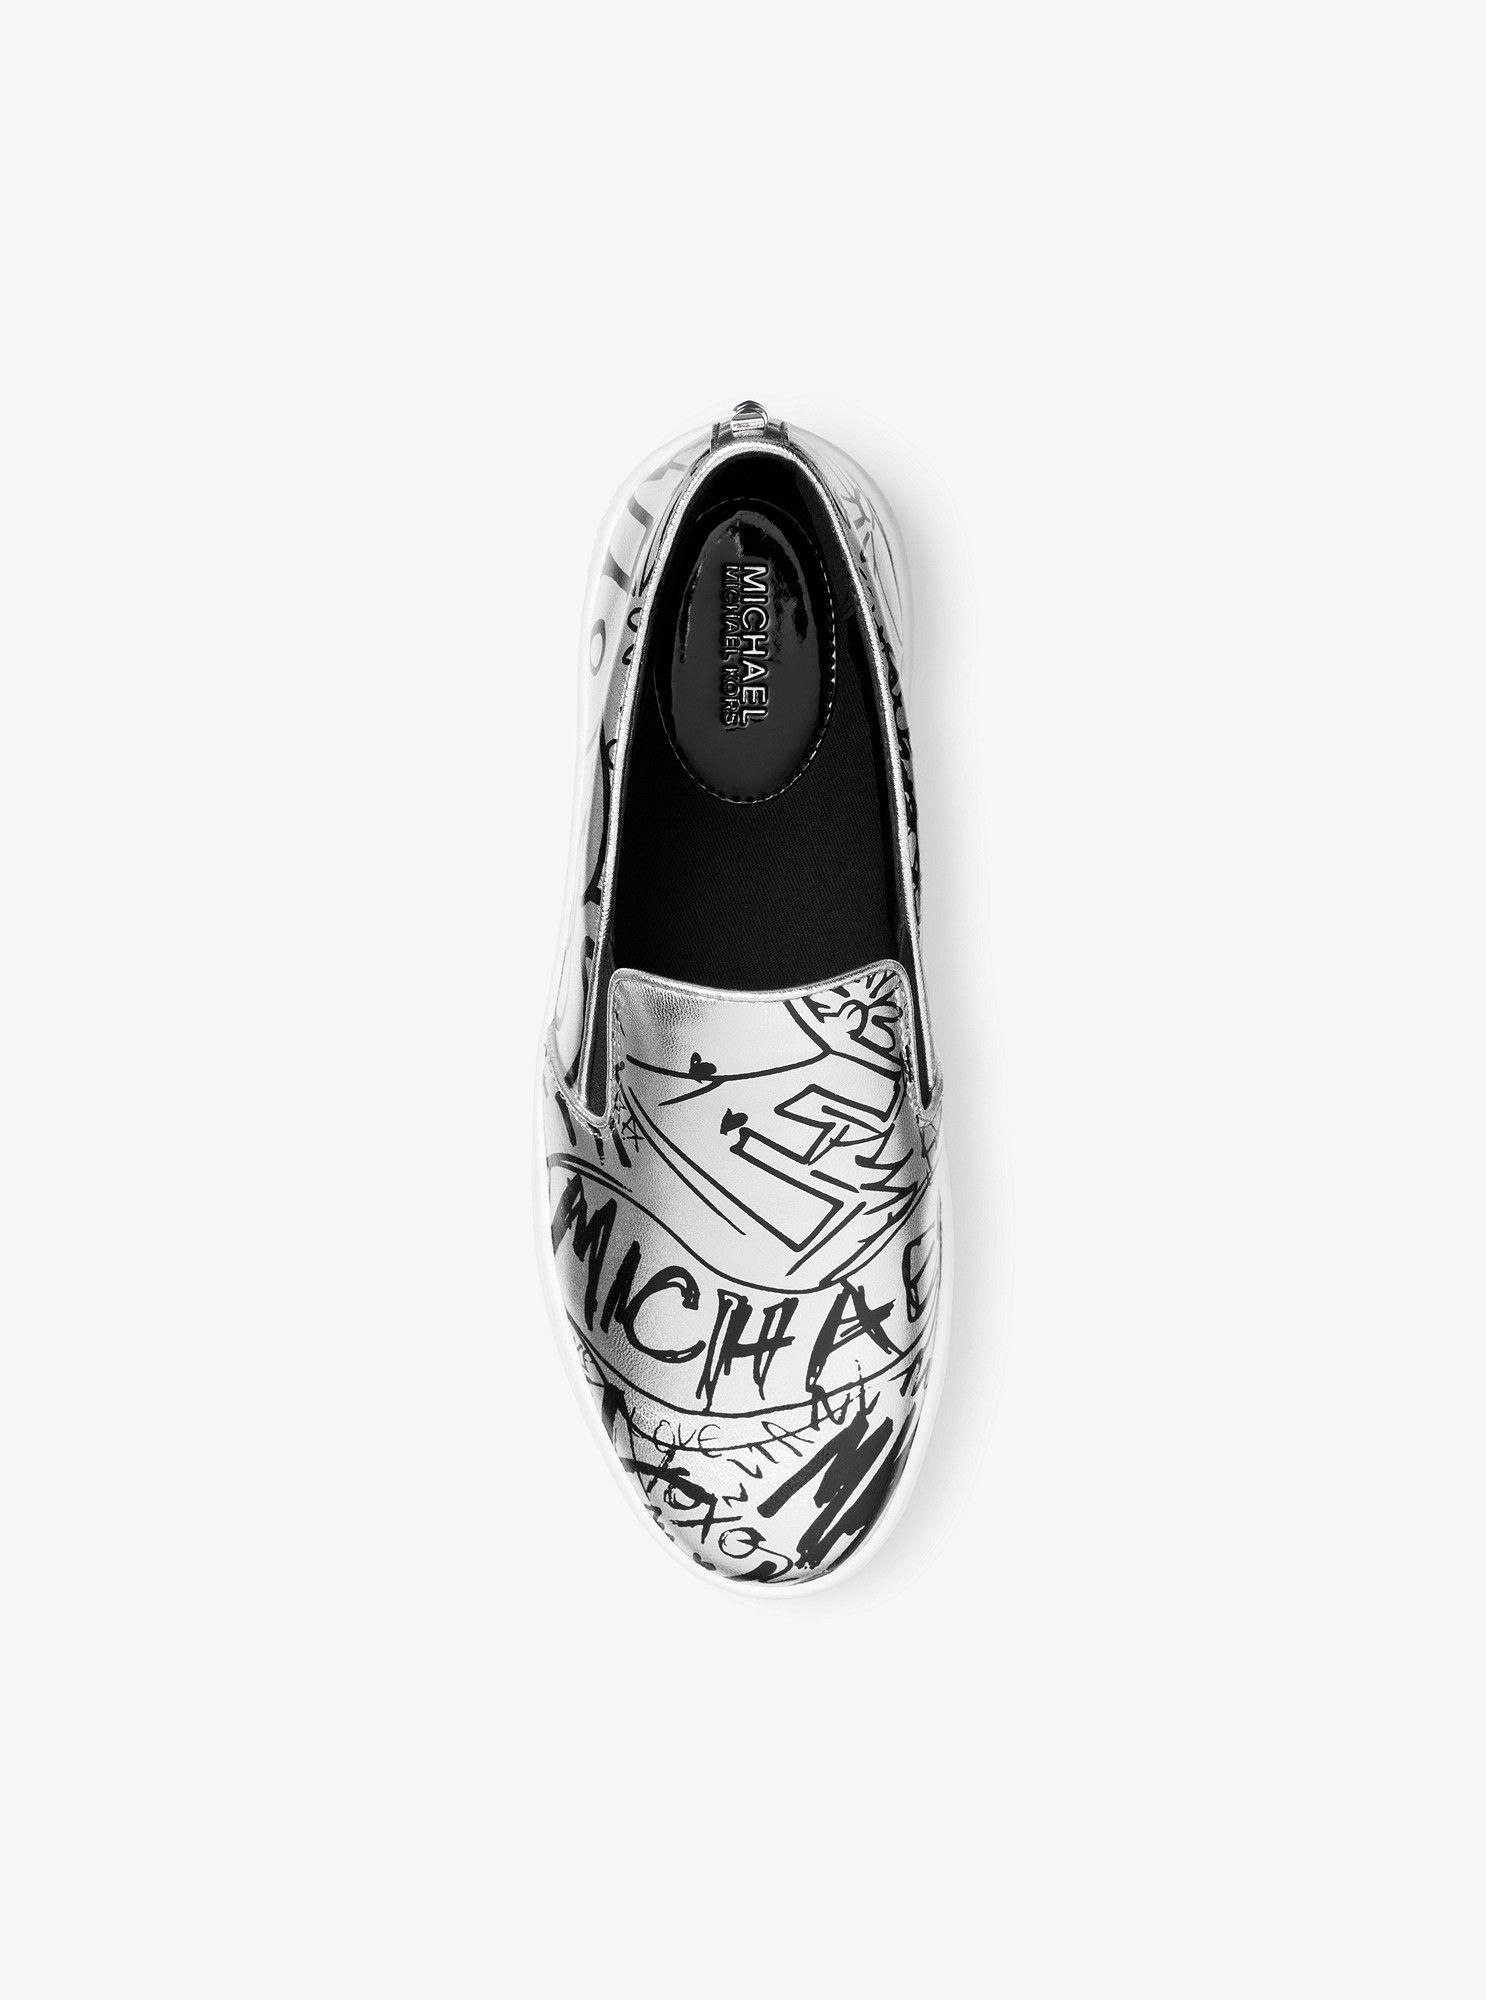 446a3e4139e75 Keaton Metallic Graffiti Leather Slip-On Sneaker by Michael Kors ...